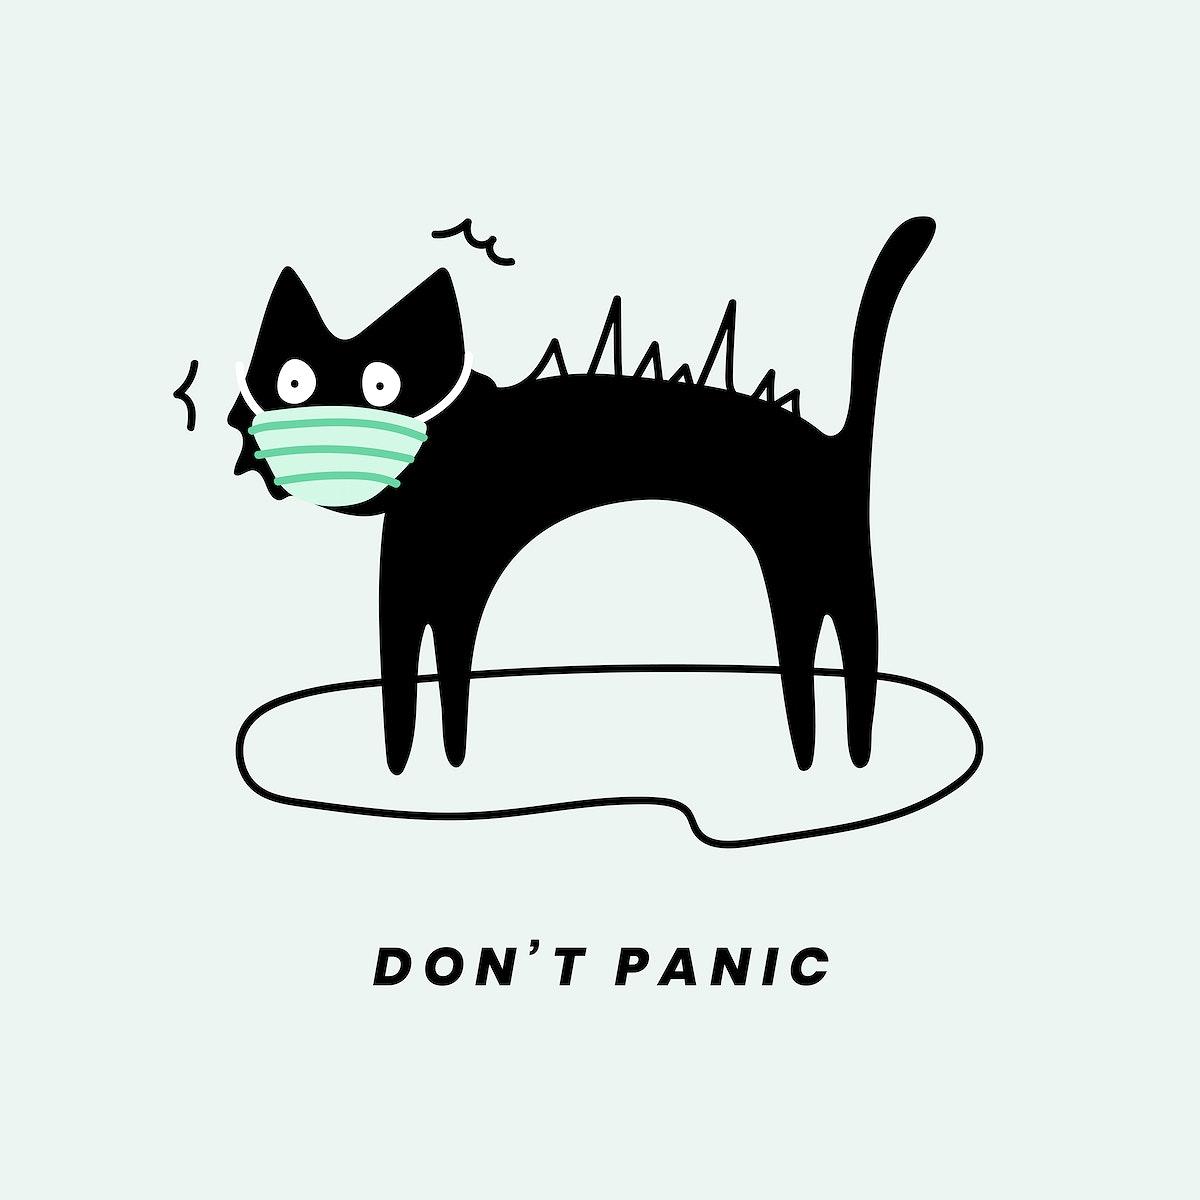 Don't panic black cat social template vector